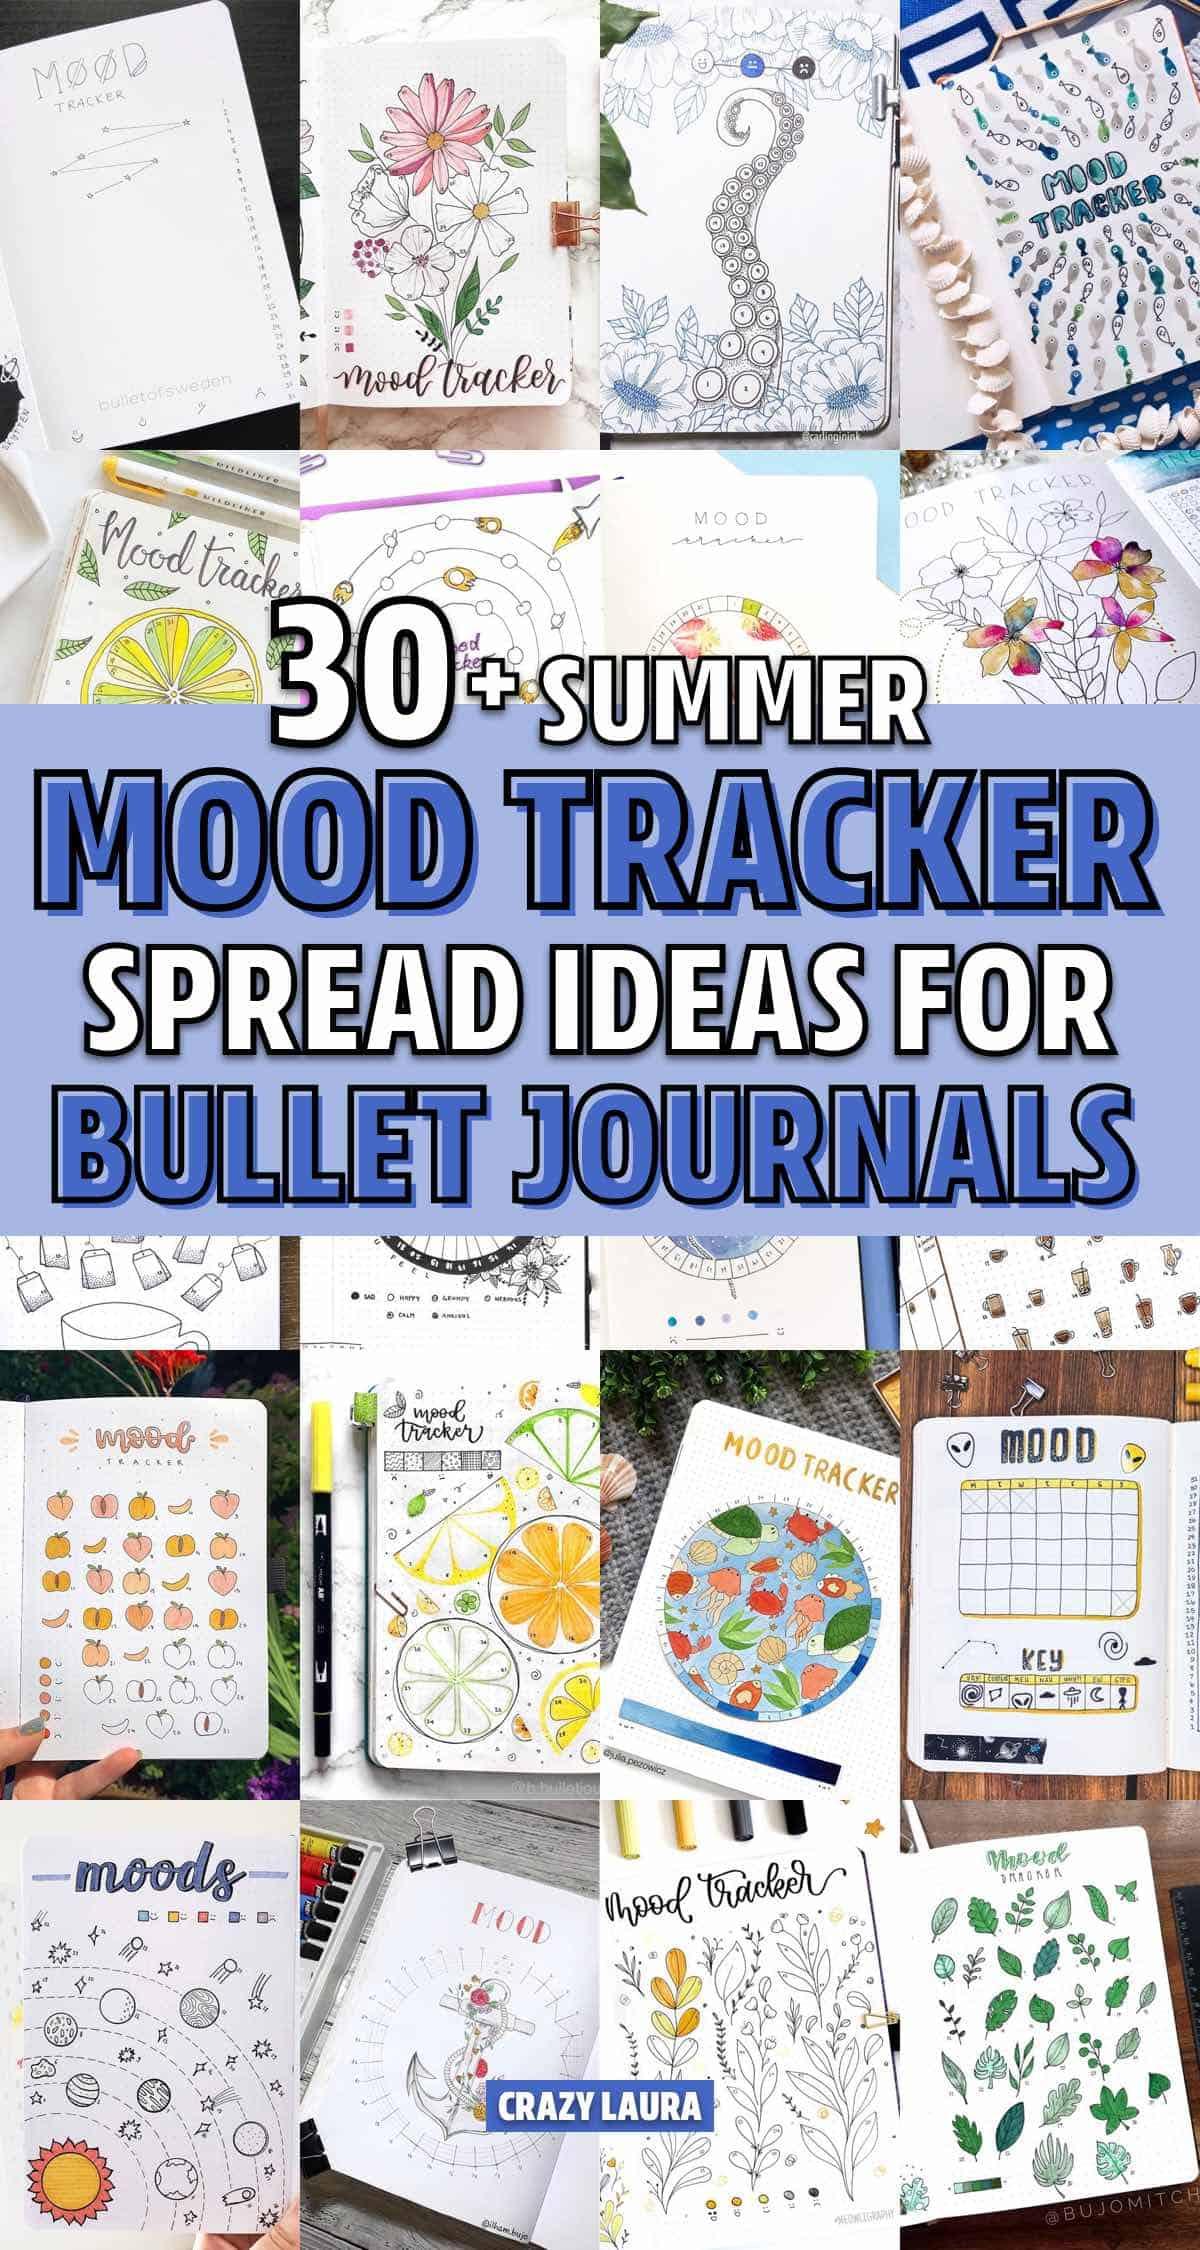 easy mood tracker ideas for summer